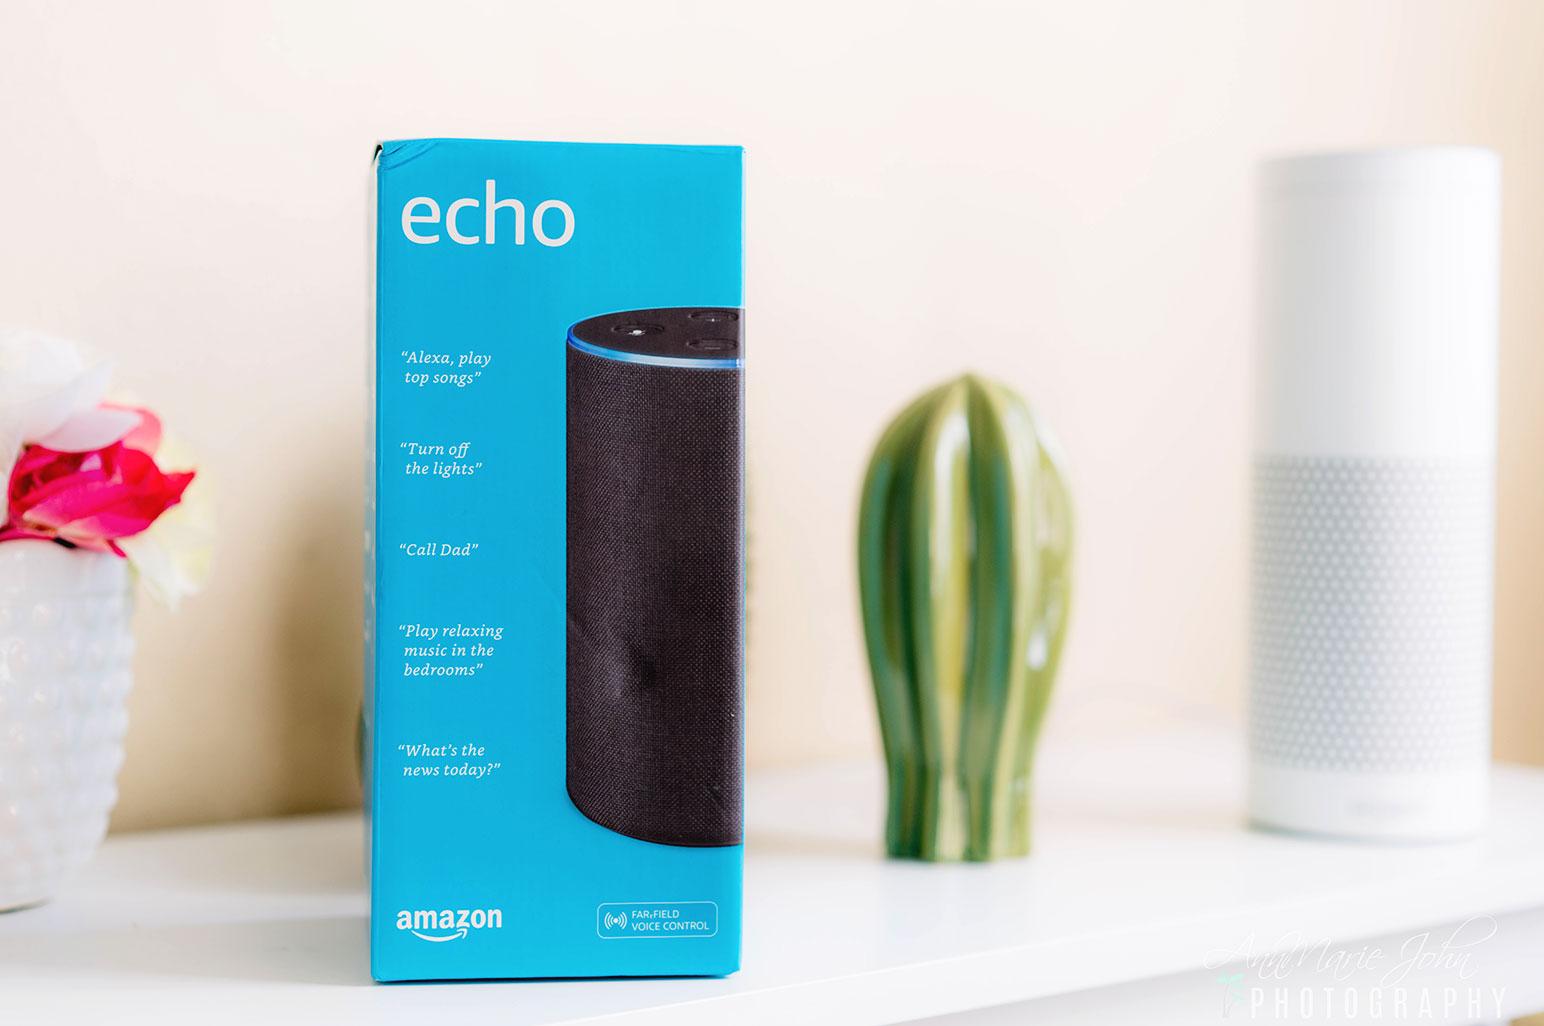 Alexa Skill Blueprints ~ Amazon Echo Giveaway - AnnMarie